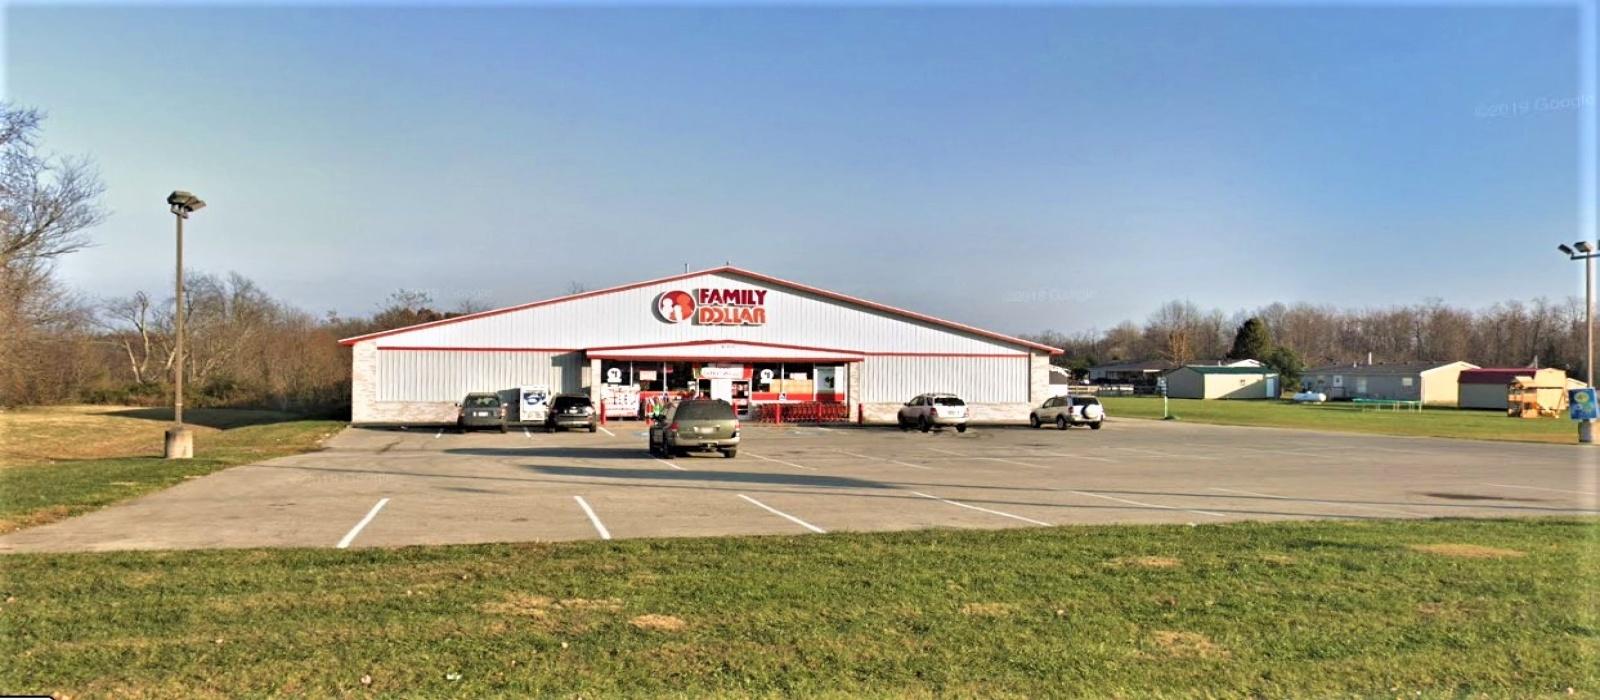 600 N Columbus, Russellville, Ohio 45168, ,Retail,For Sale,600 N Columbus,1053